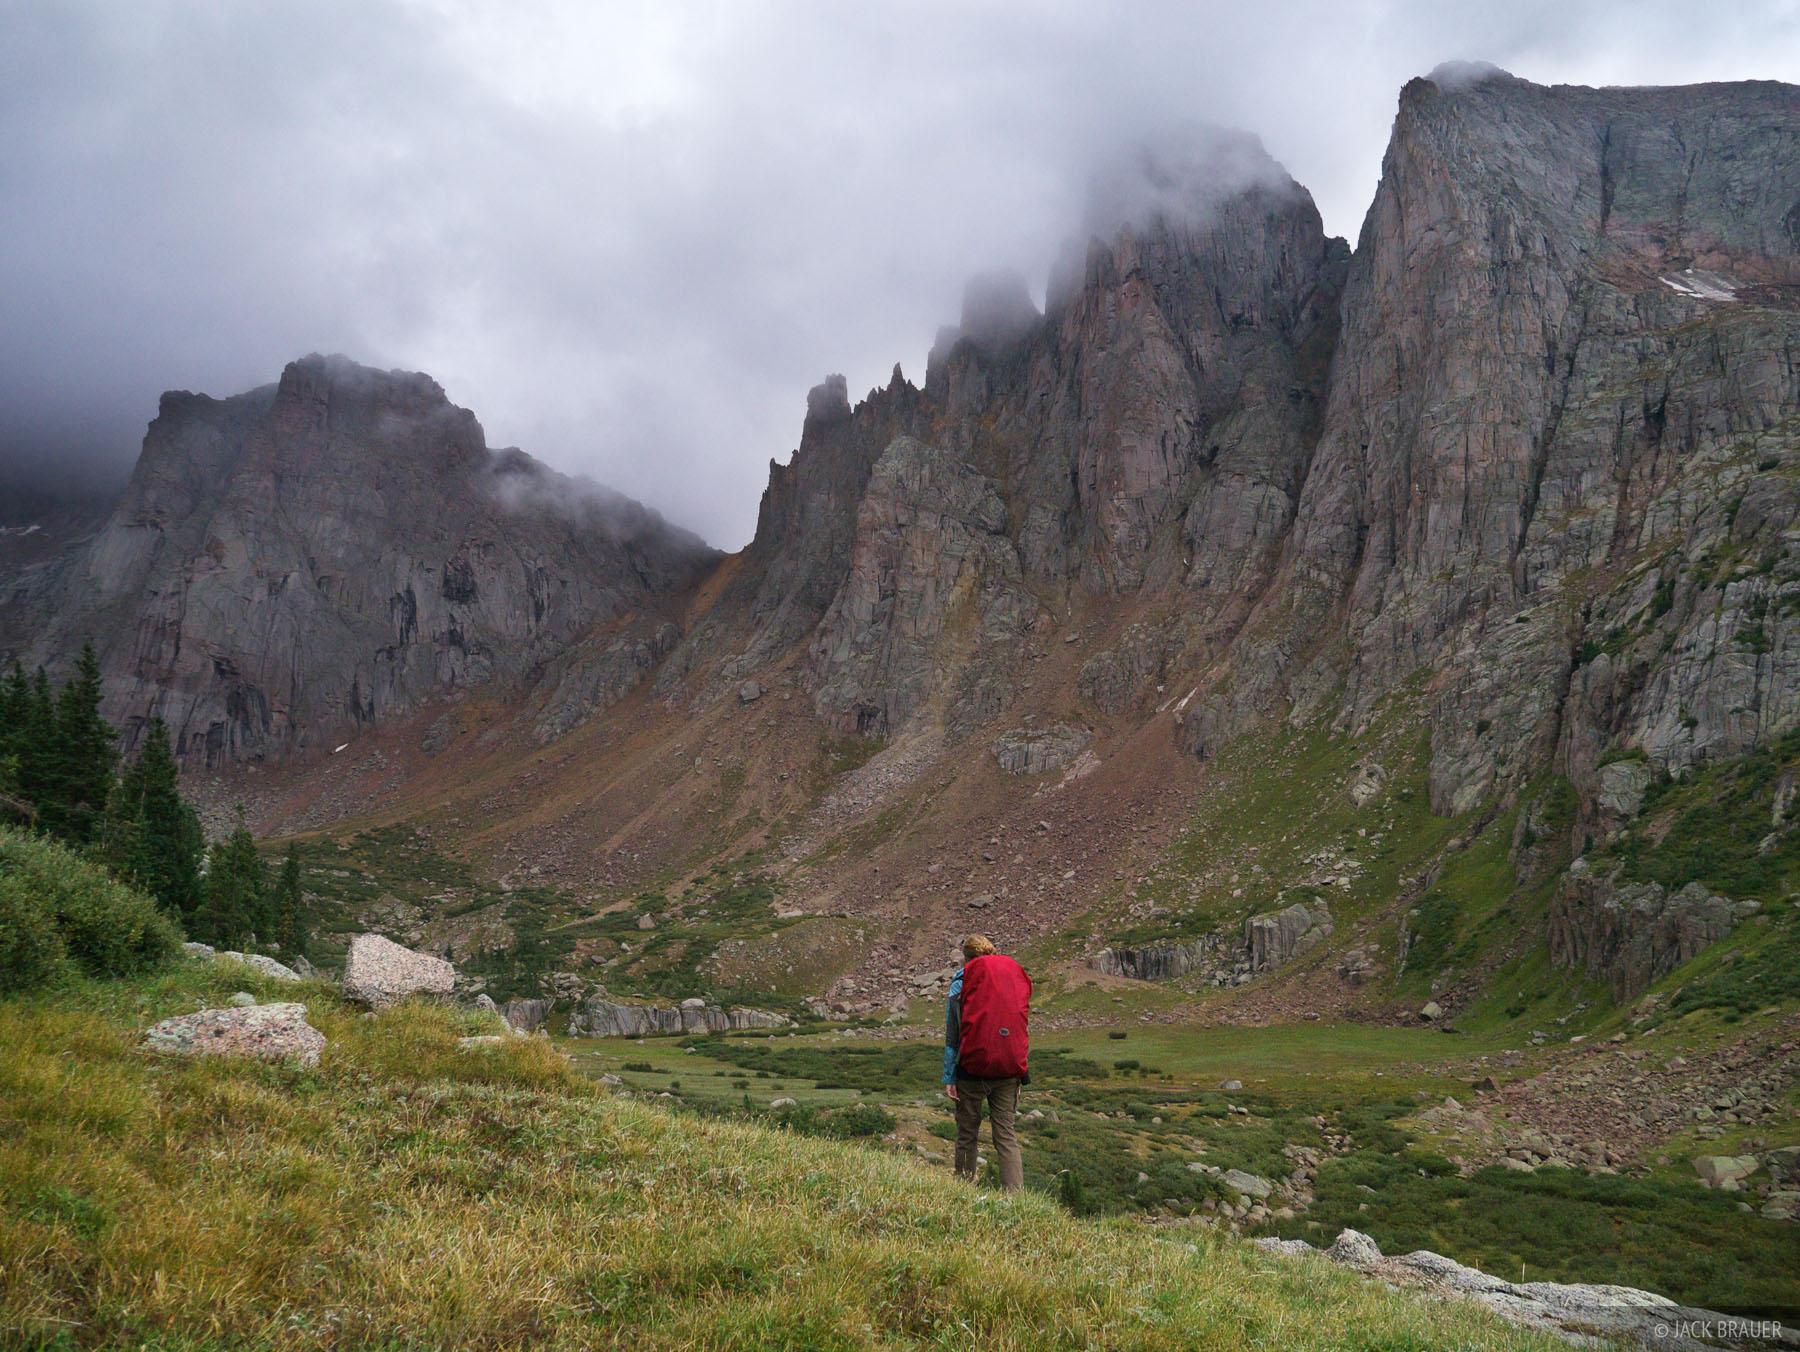 hiking, San Juan Mountains, Colorado, Needle Mountains, August, Weminuche, Weminuche Wilderness, active, 2012